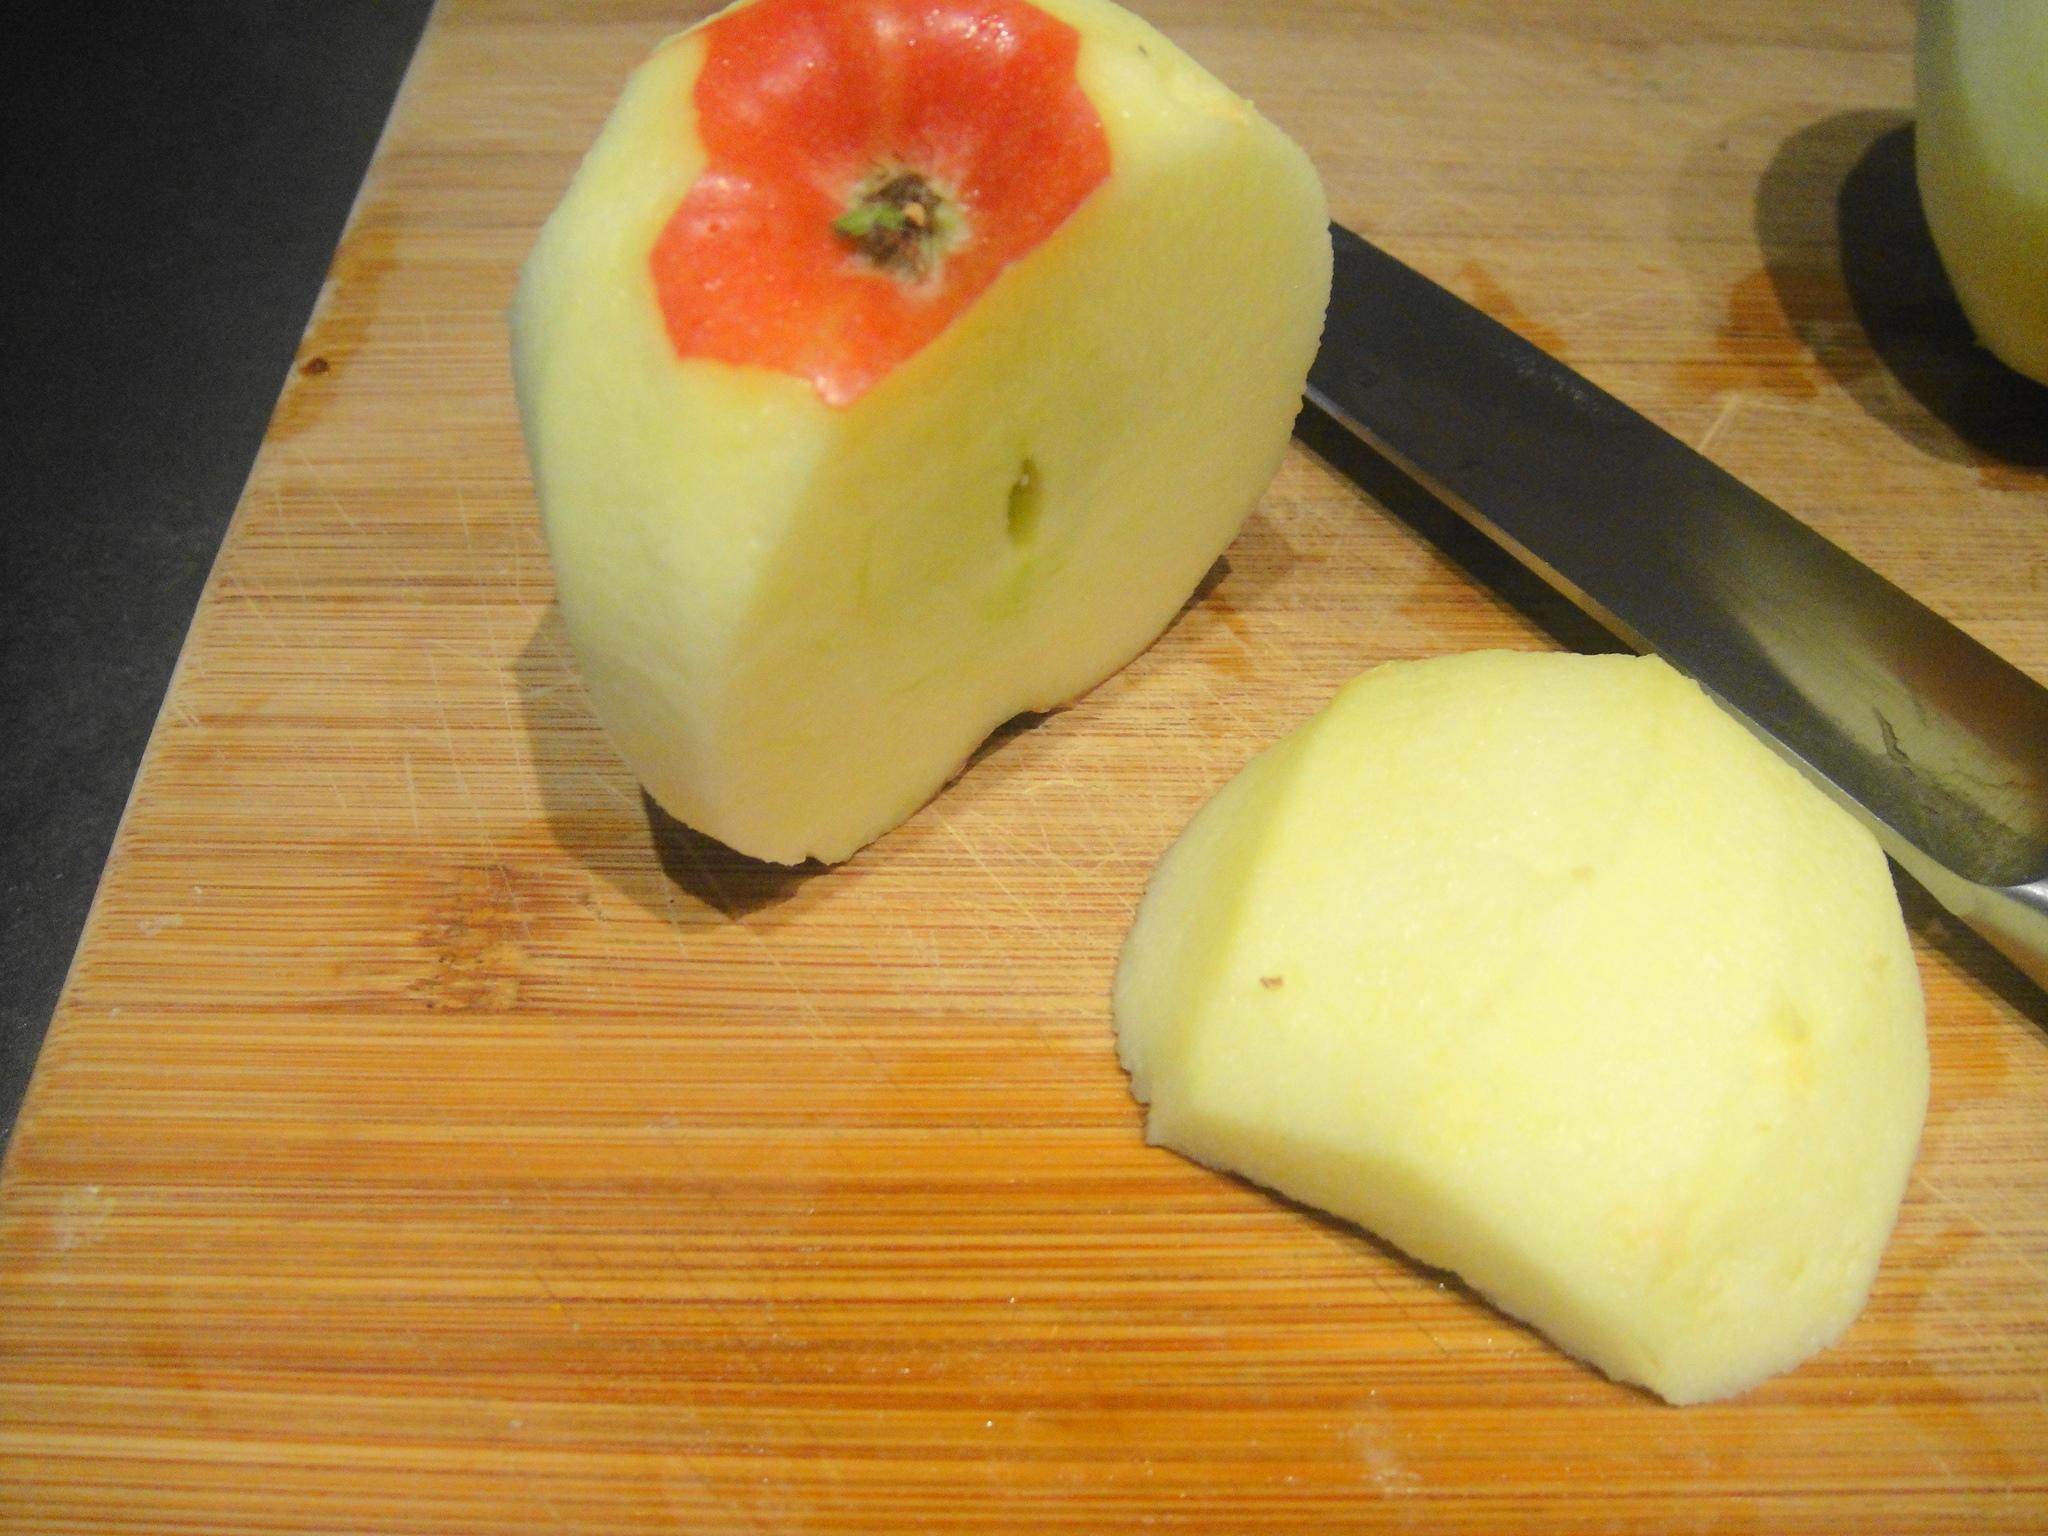 slicing apple 1